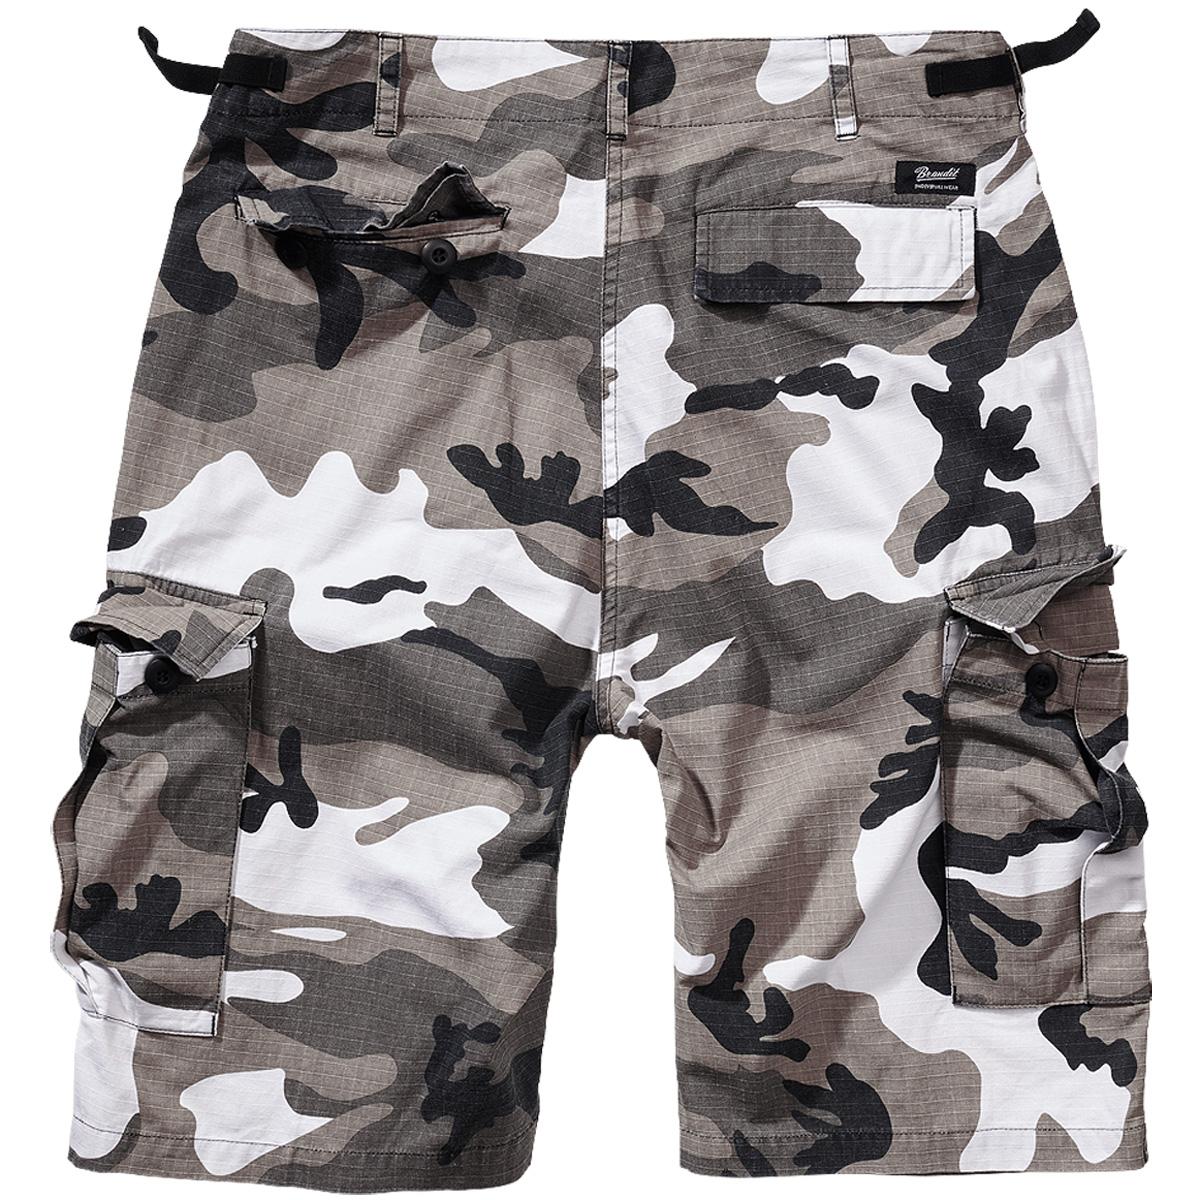 Brandit-BDU-Ripstop-Shorts-S-7XL-Army-Cargo-Bermuda-Outdoor-Short-kurze-Hose miniatura 13